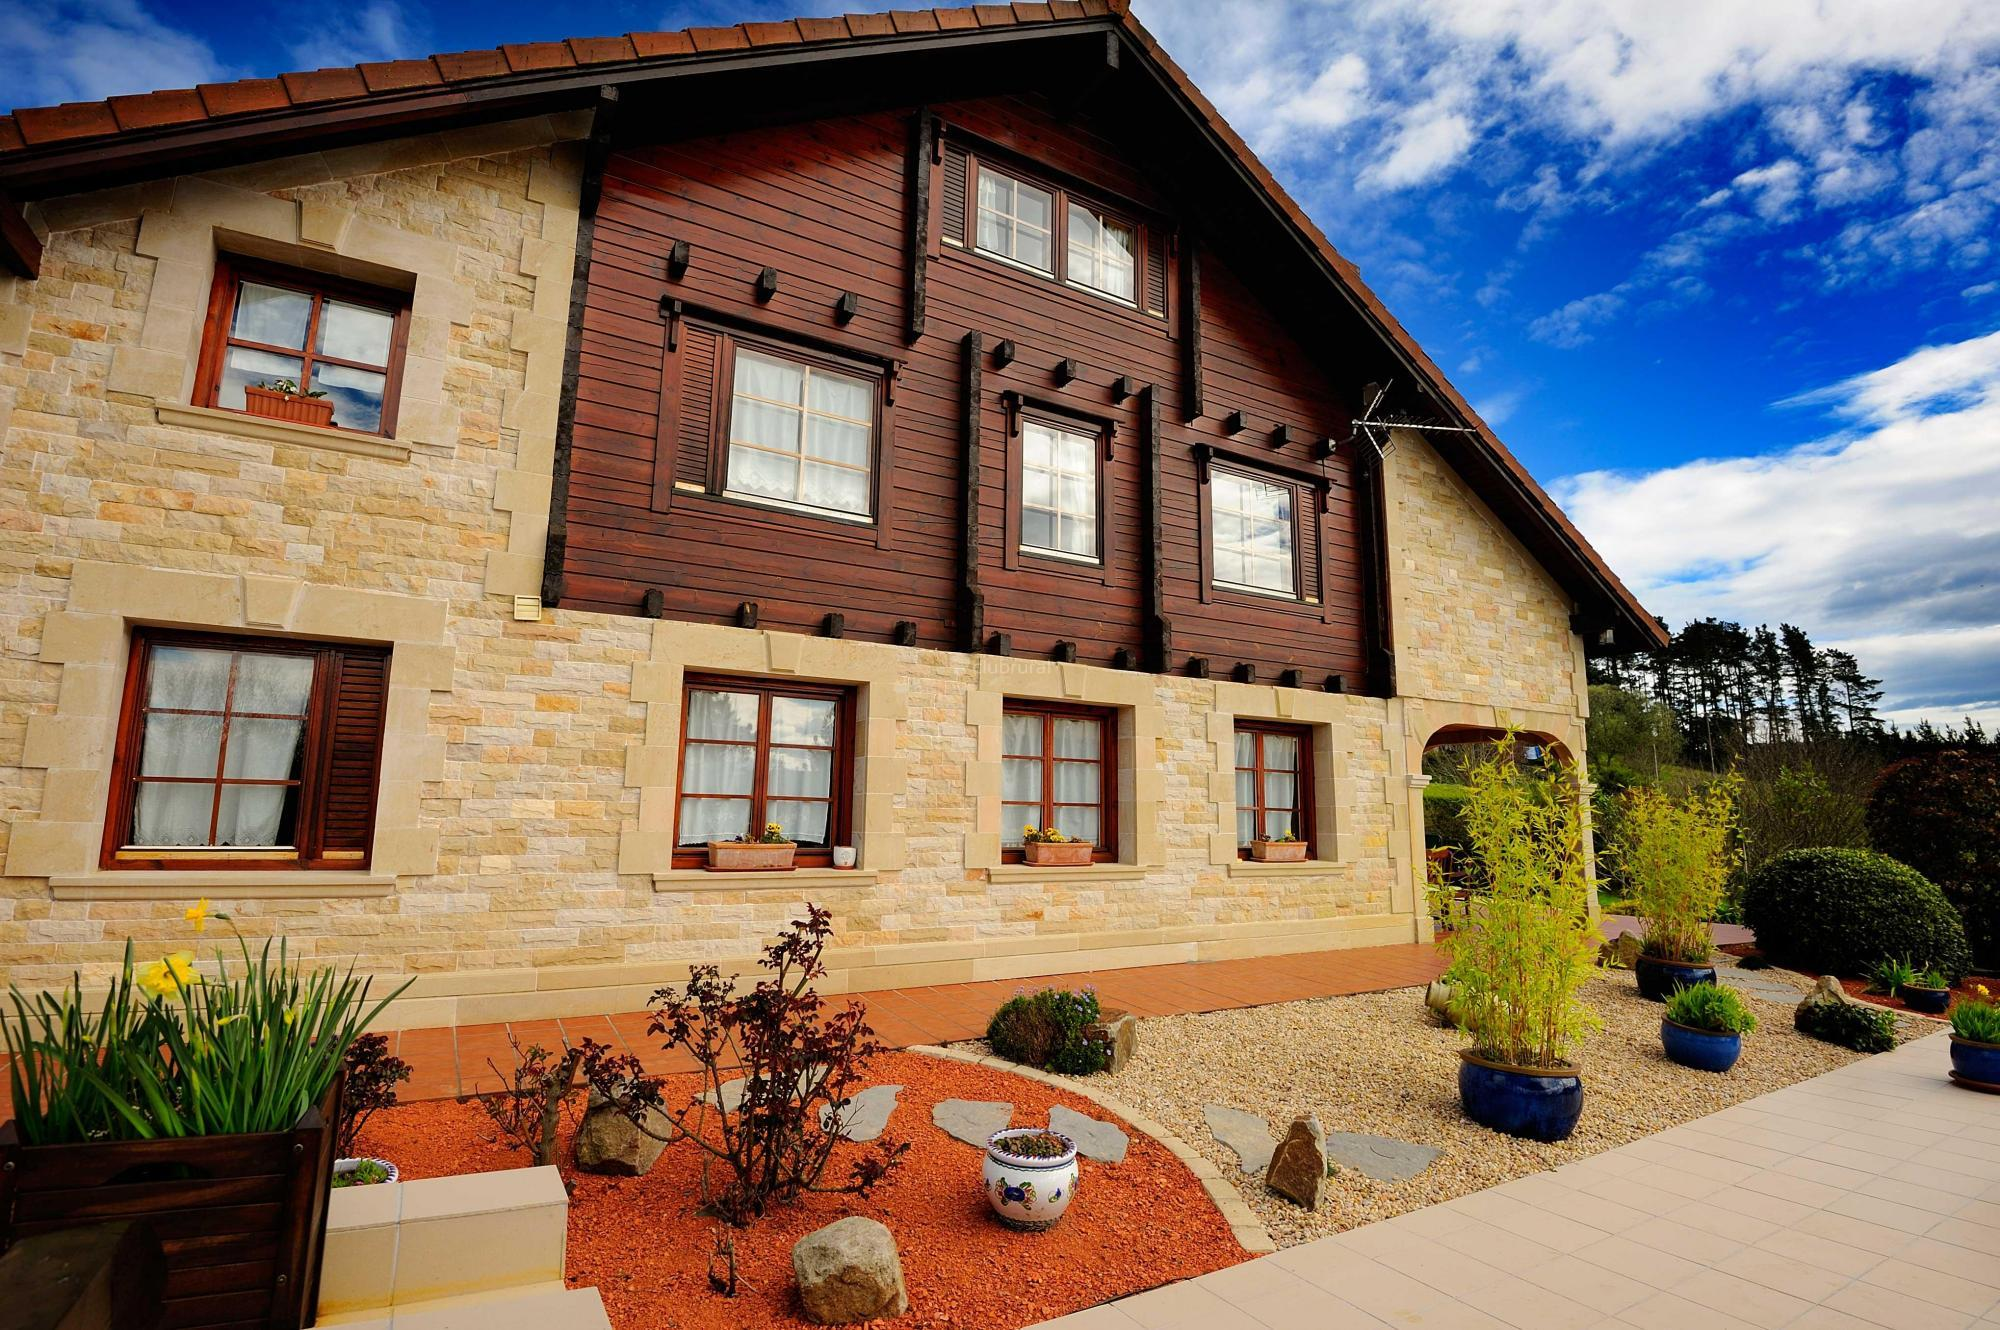 Fotos de la casa de madera vizcaya arrieta clubrural - Casa rural de madera ...